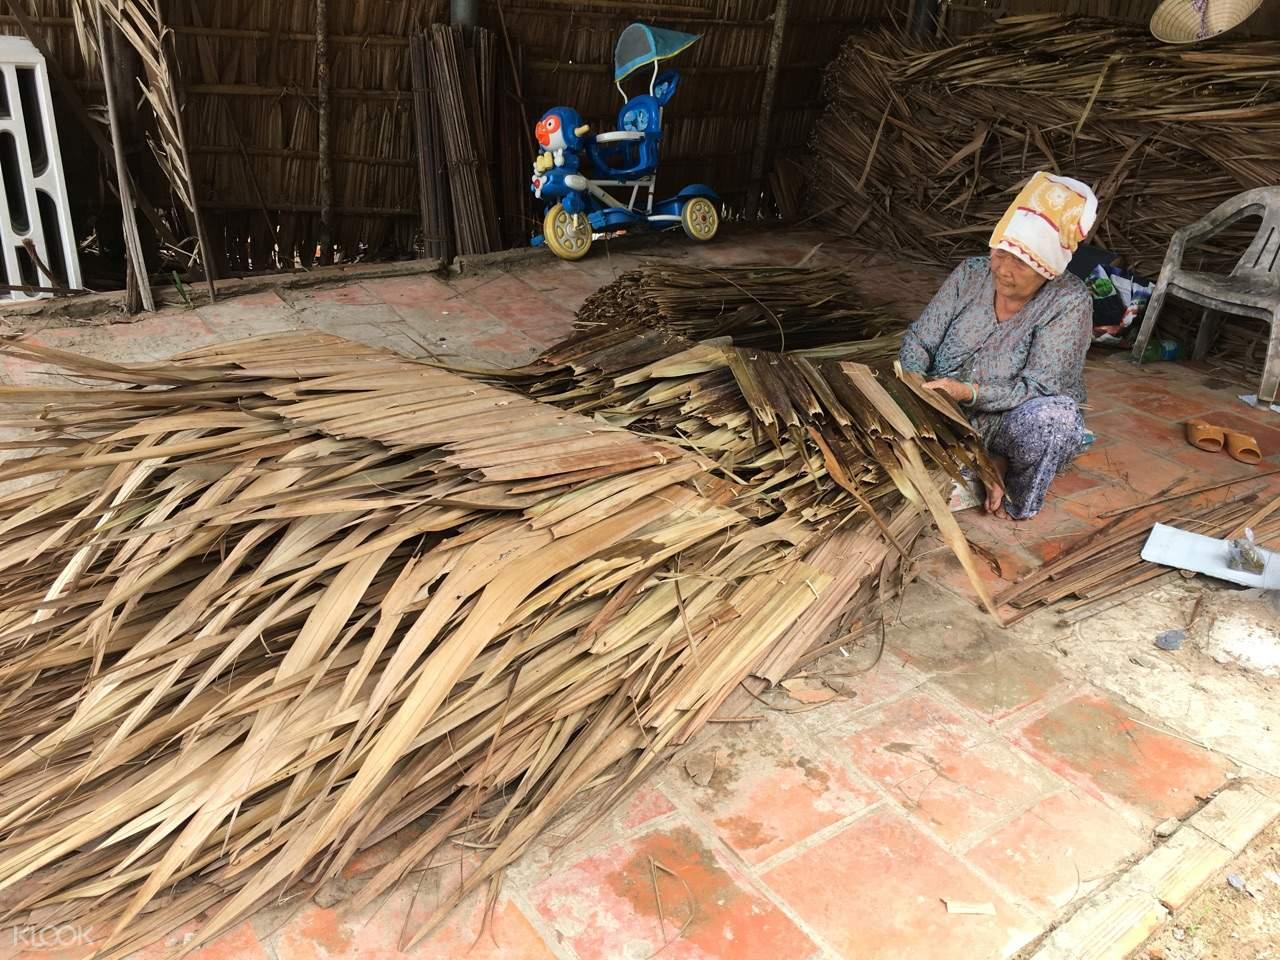 Mekong Delta handicraft village